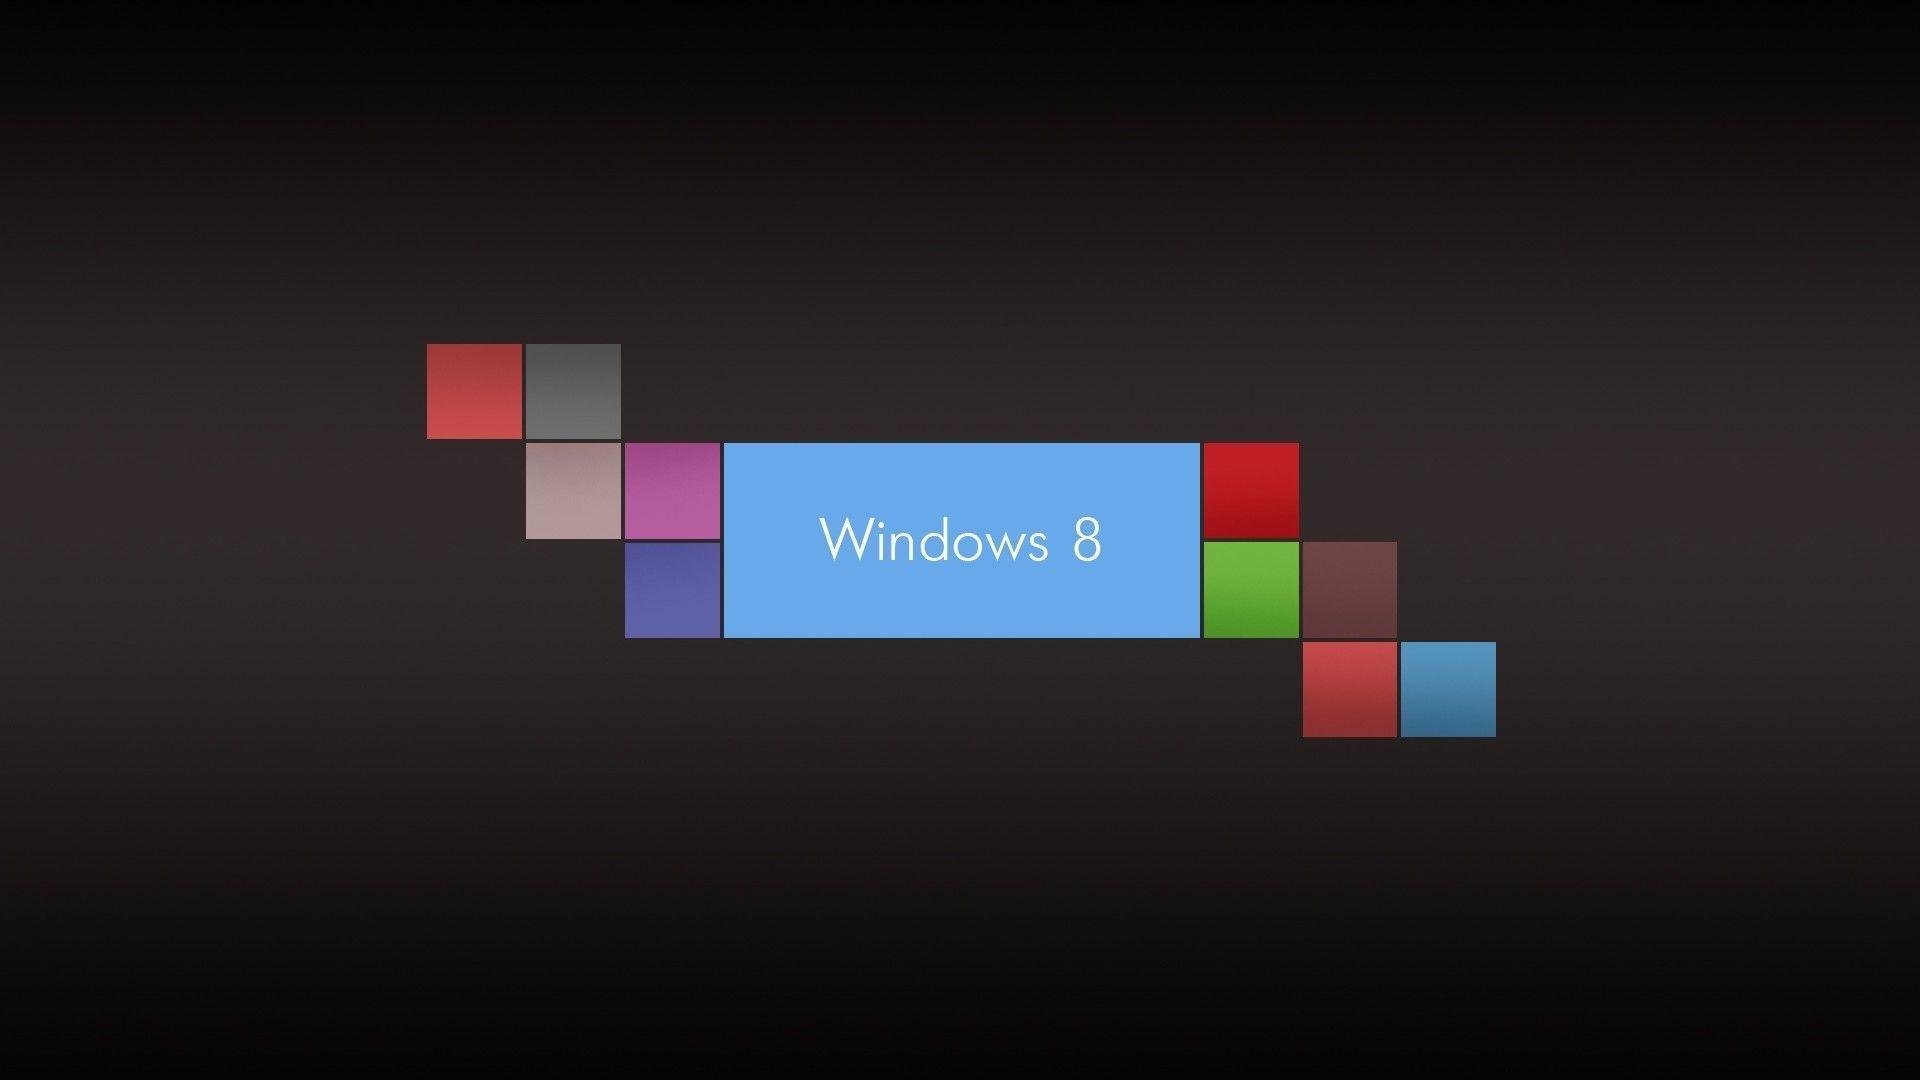 Microsoft windows full hd wallpaper amazing wallpaperz hd full hd p windows wallpapers hd desktop backgrounds voltagebd Choice Image